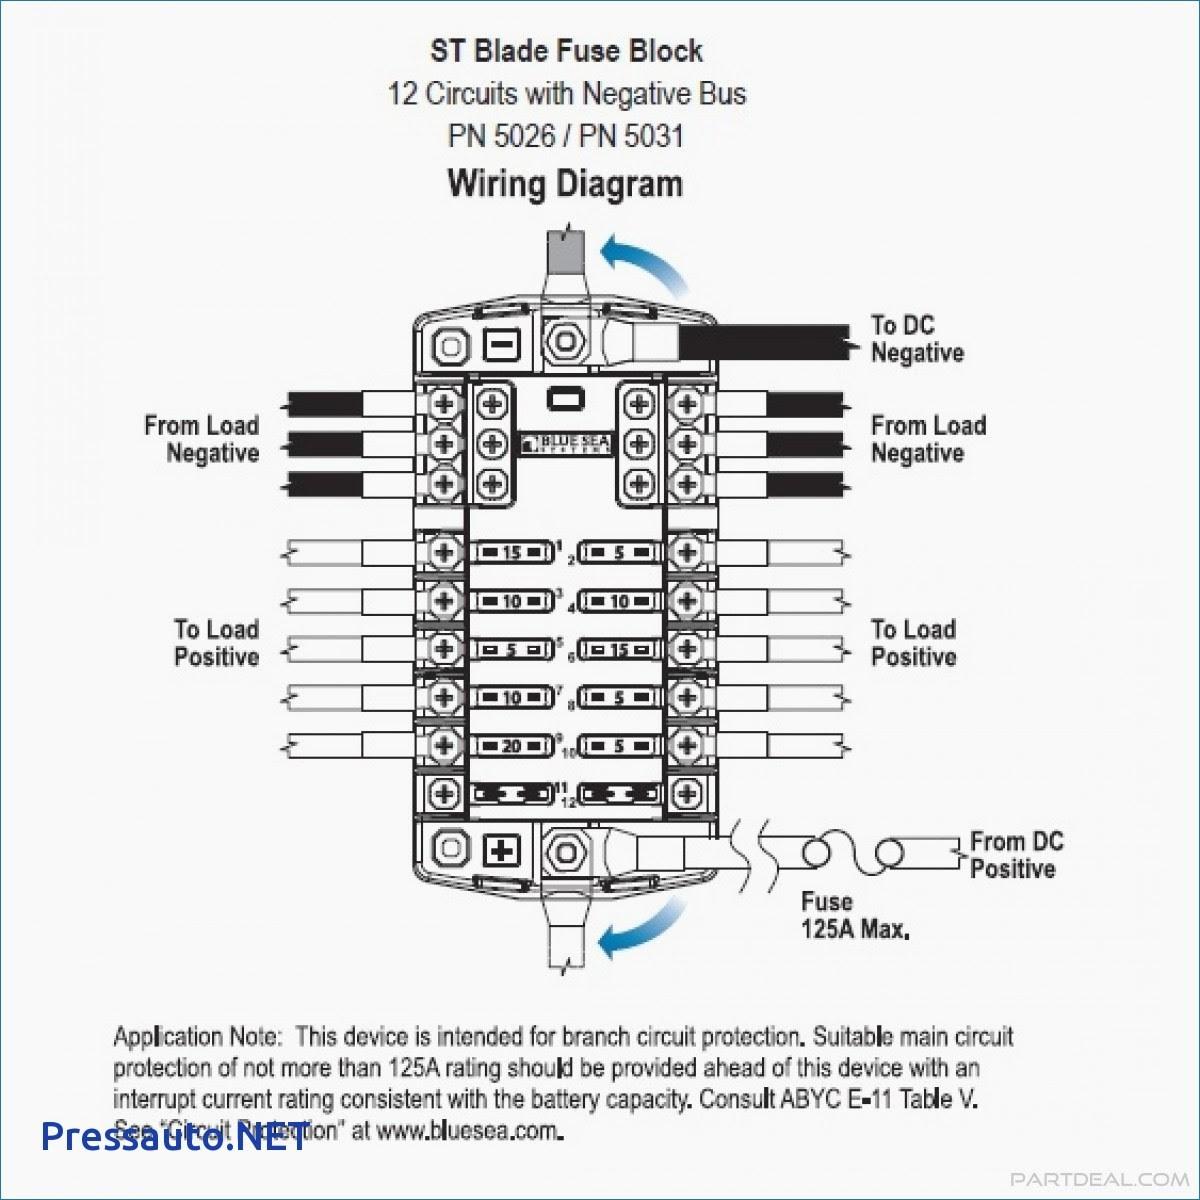 Diagram Electric Block Wiring Diagram Full Version Hd Quality Wiring Diagram Skematik110isi Gsdportotorres It